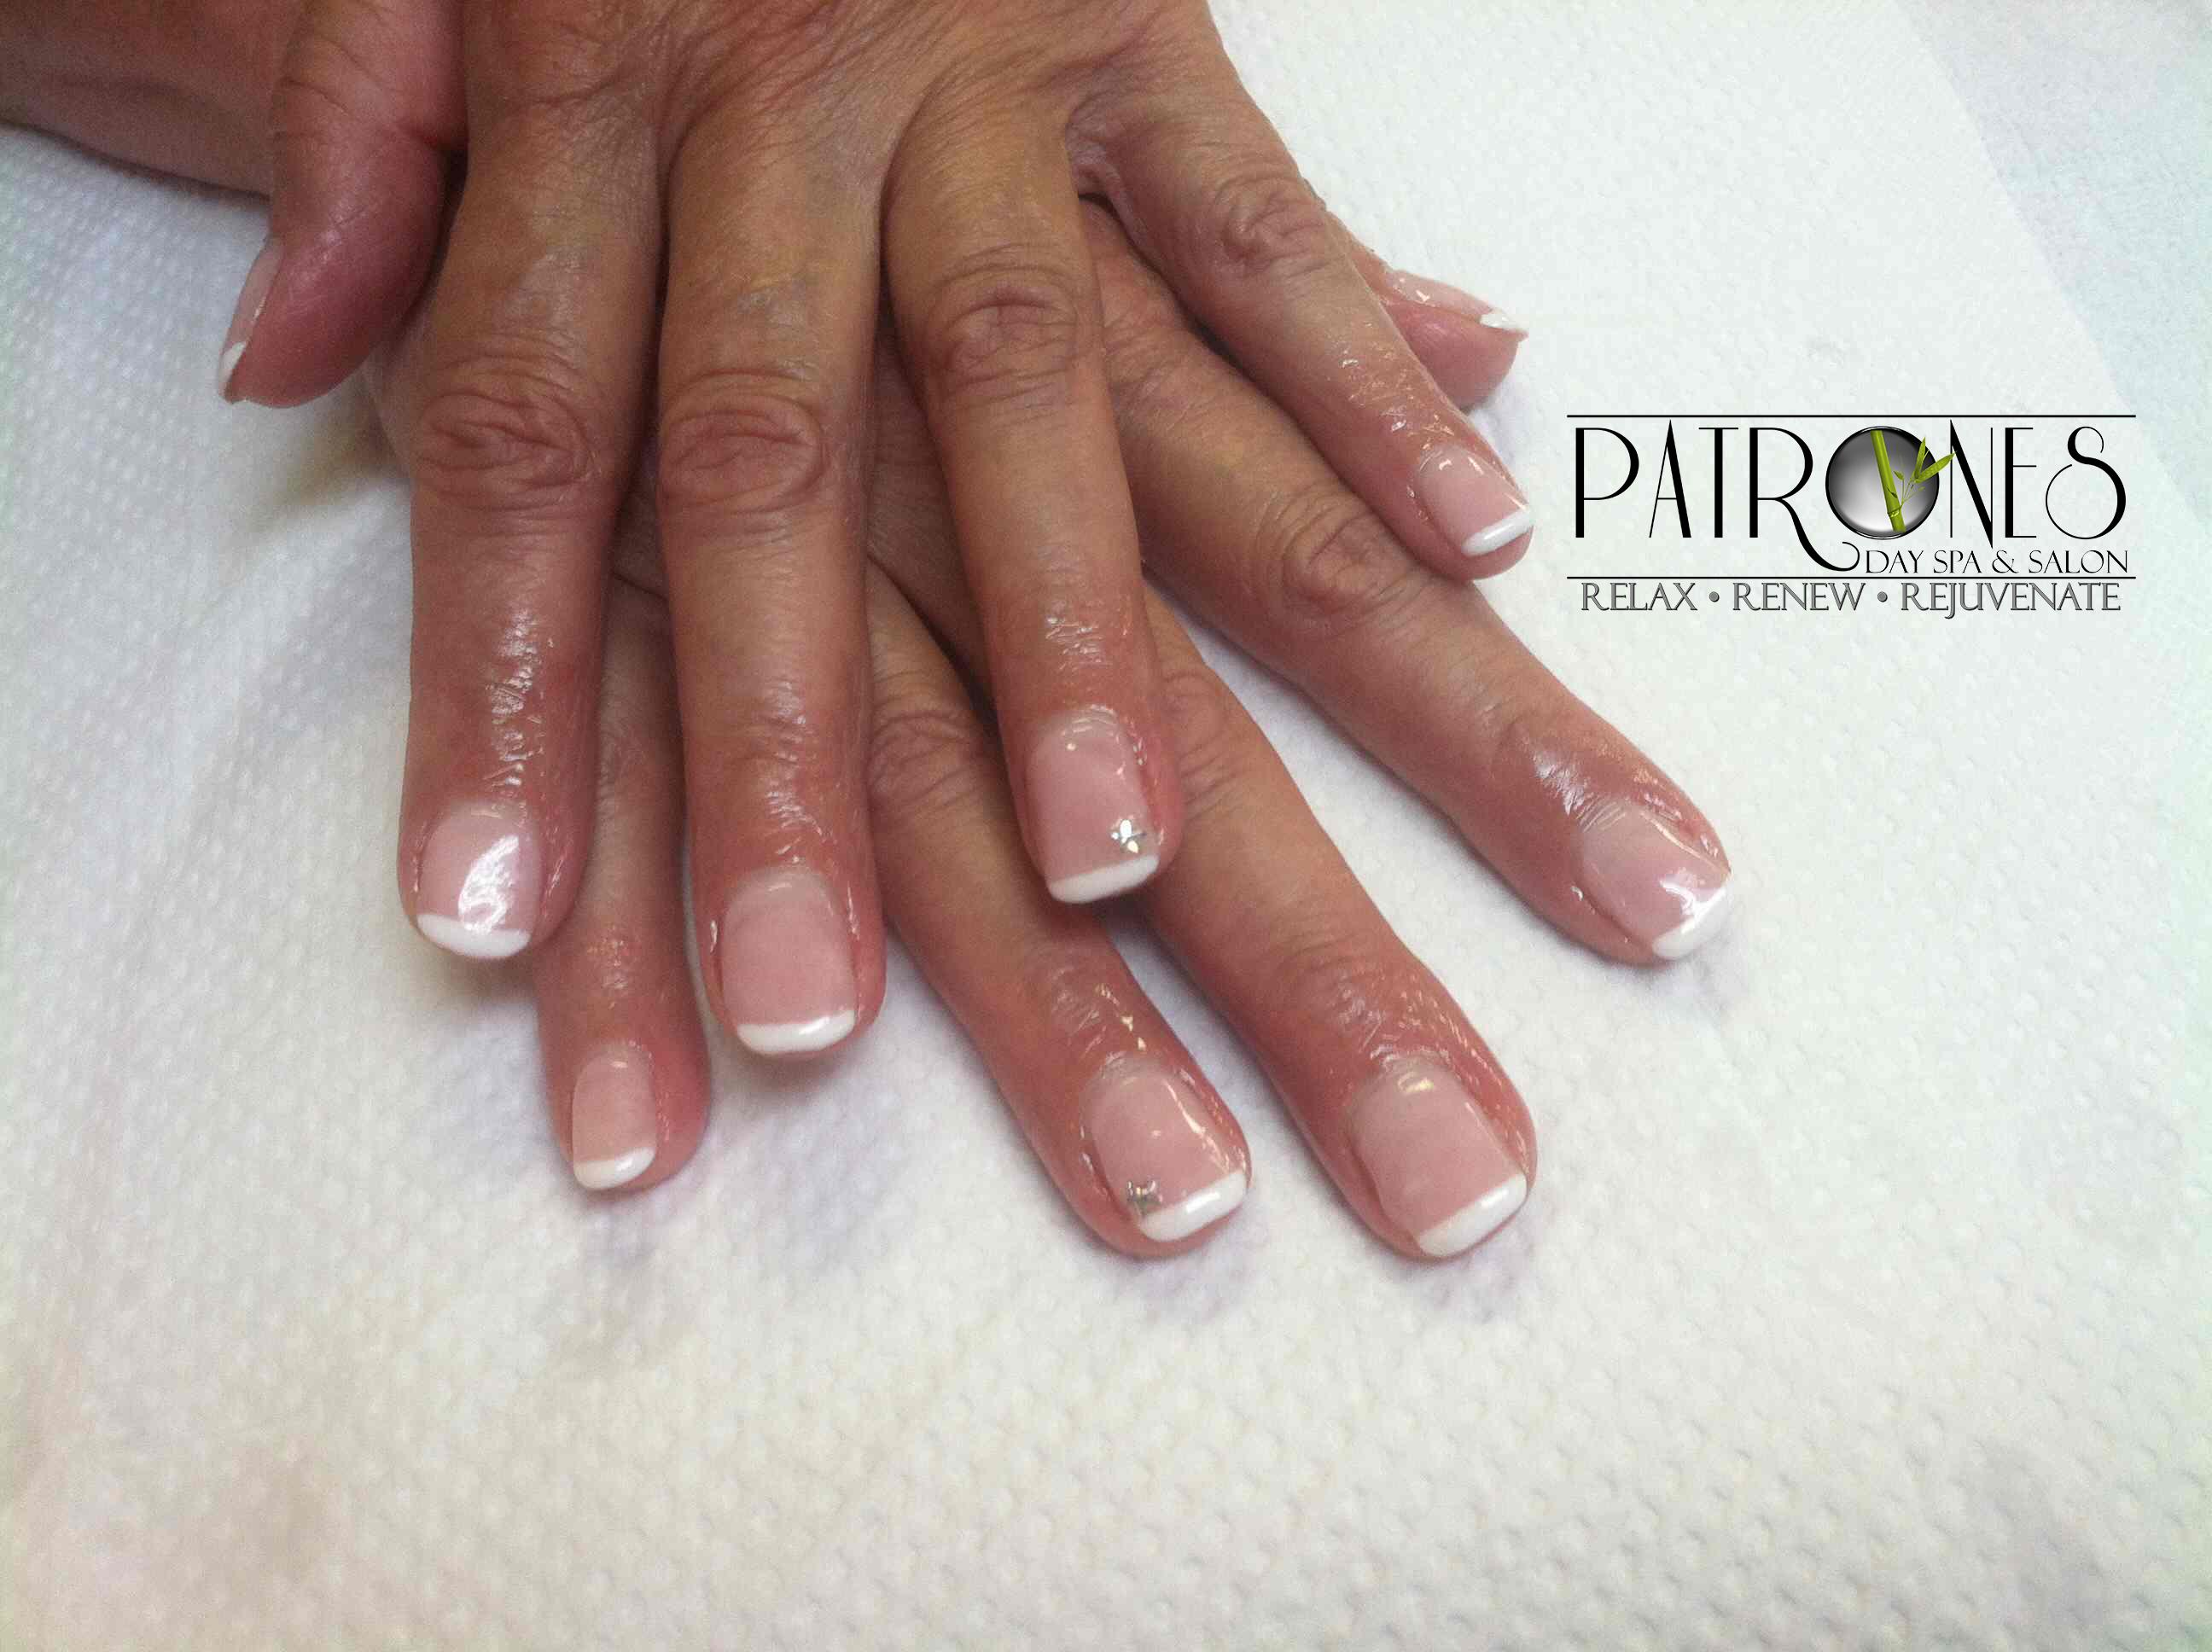 Shoshana Gel Nails Overlay with Shellac French Manicure | Jackson MI